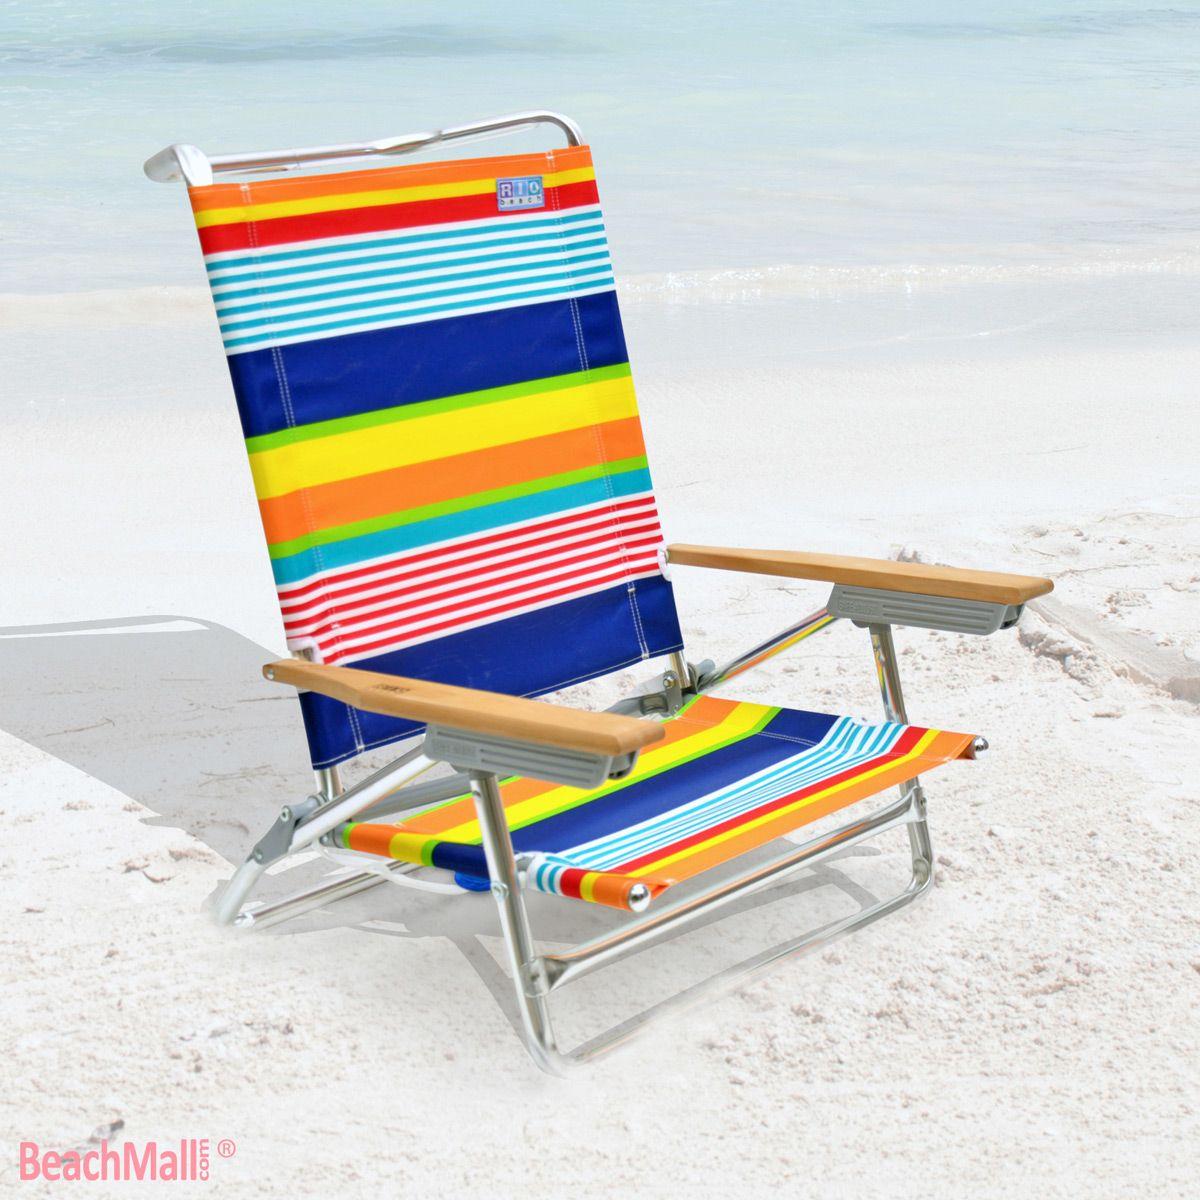 Charmant High Back Rio Beach Chair   5 Position @BeachMall.com